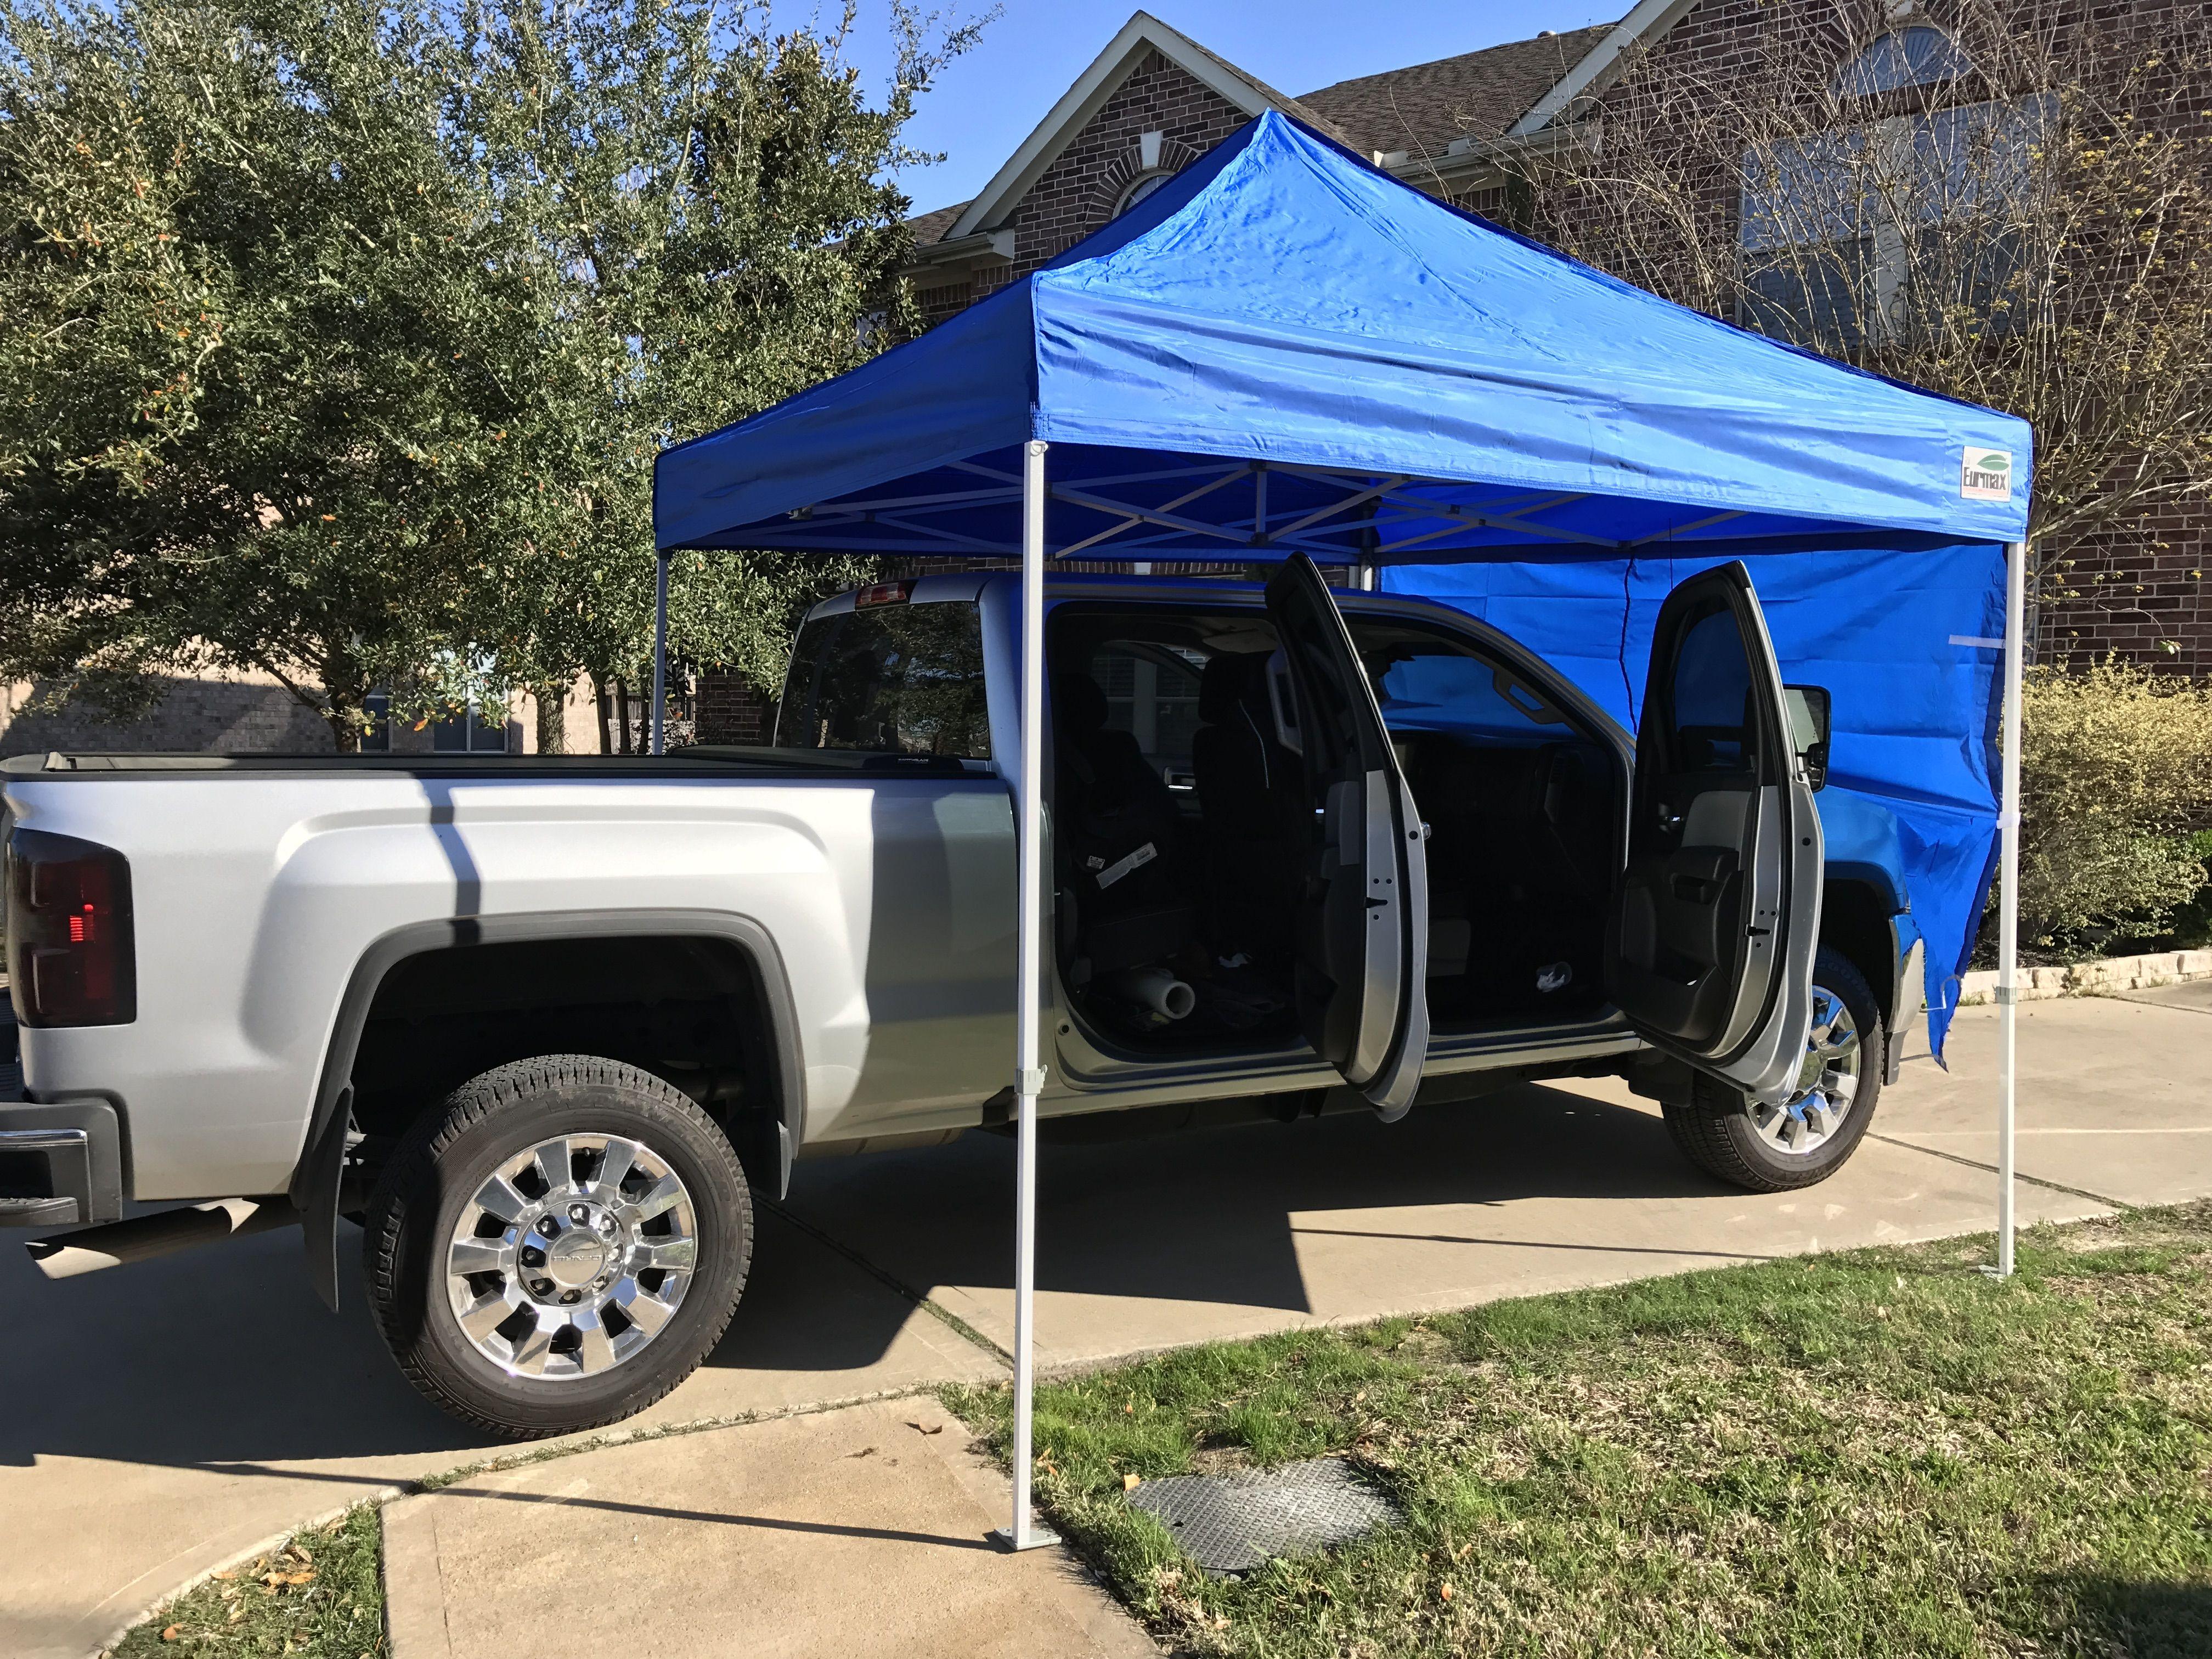 Cypress Katy Tomball Cinco Ranch Fulshear Texas Mobile Tinting